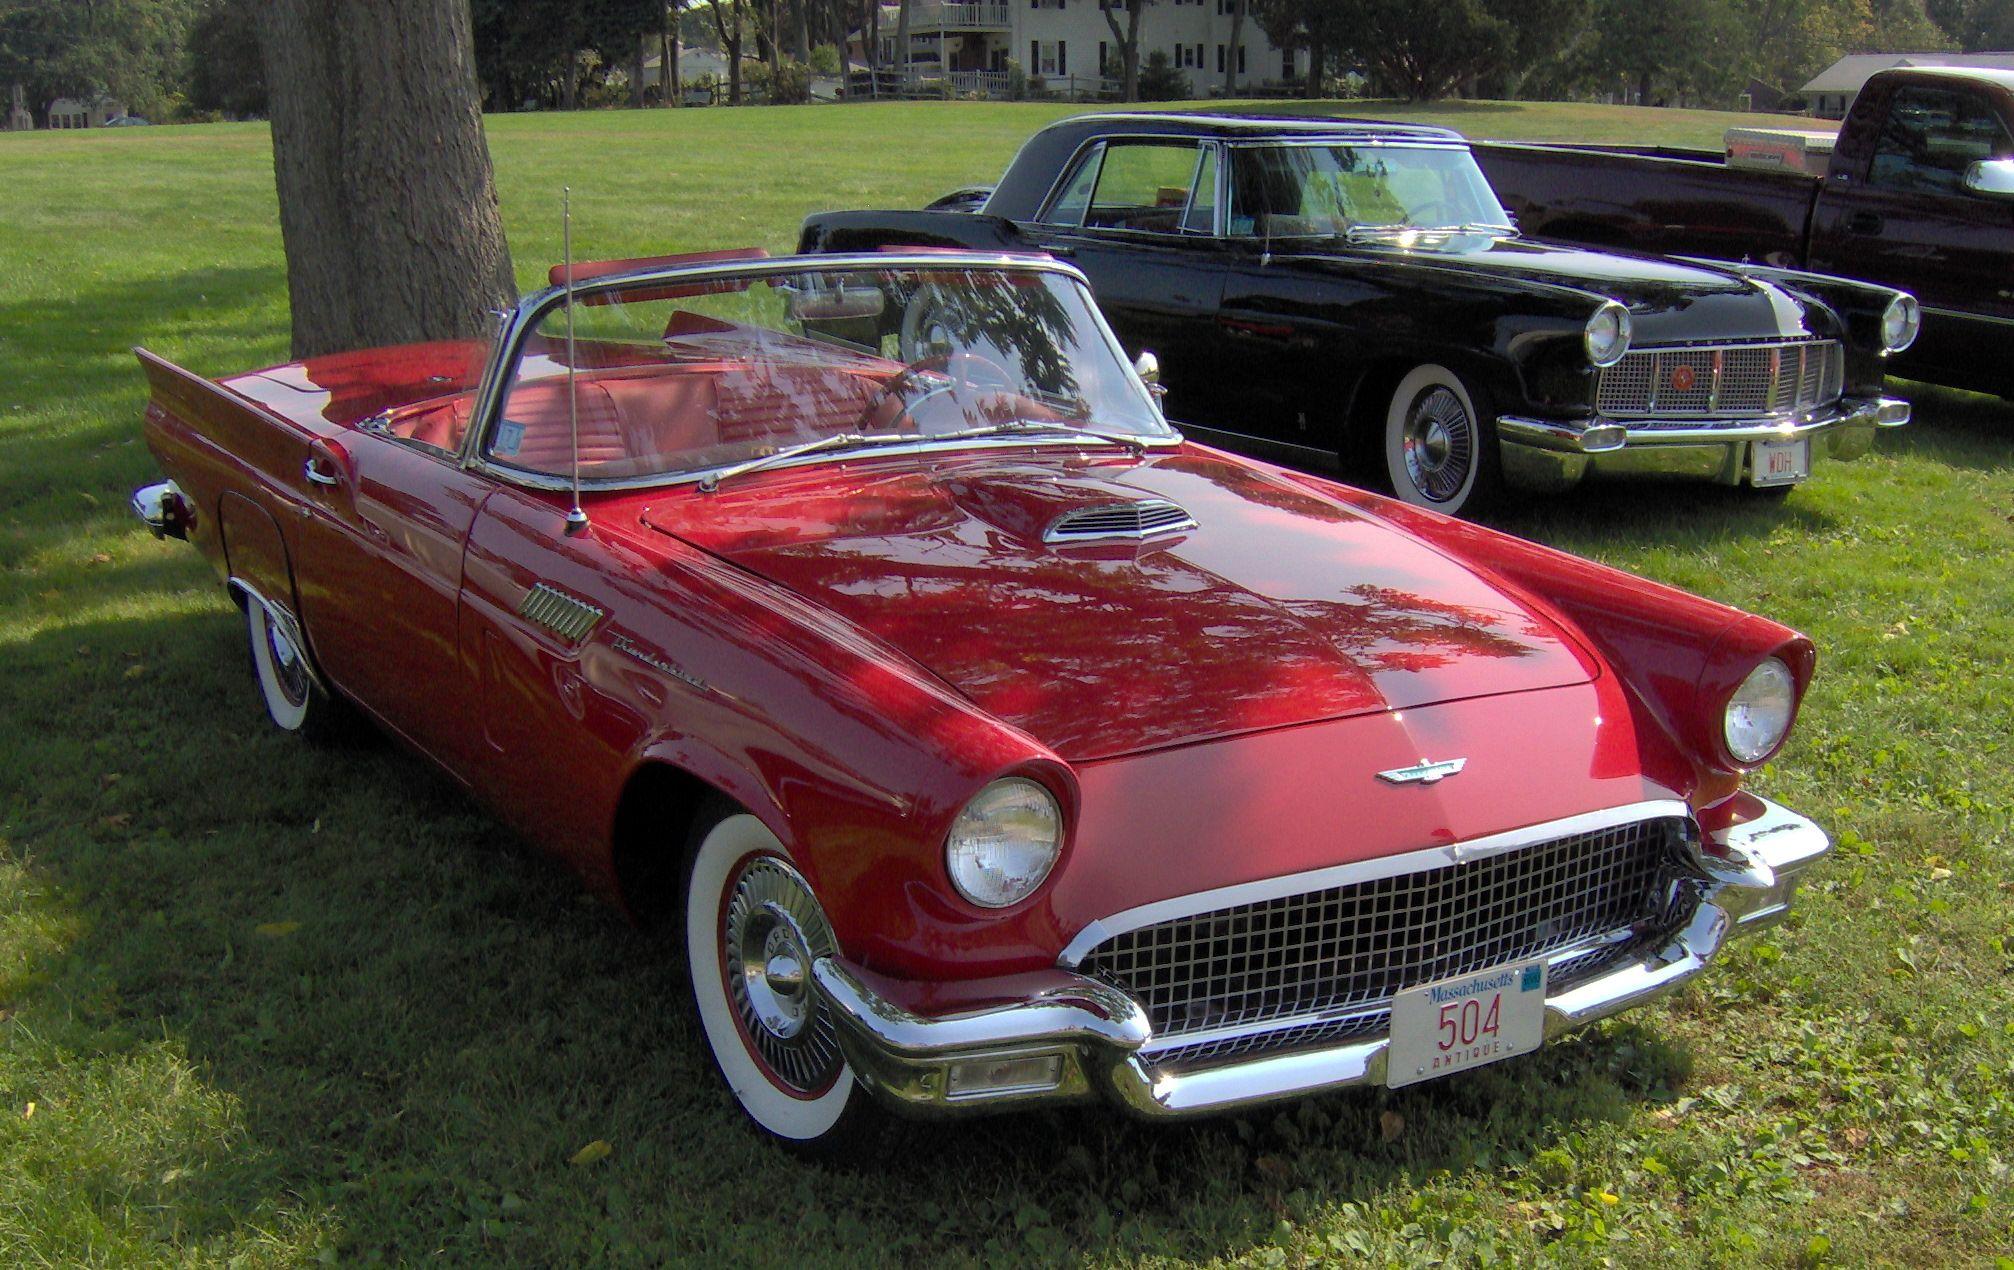 The Elegant 1957 Ford Thunderbird